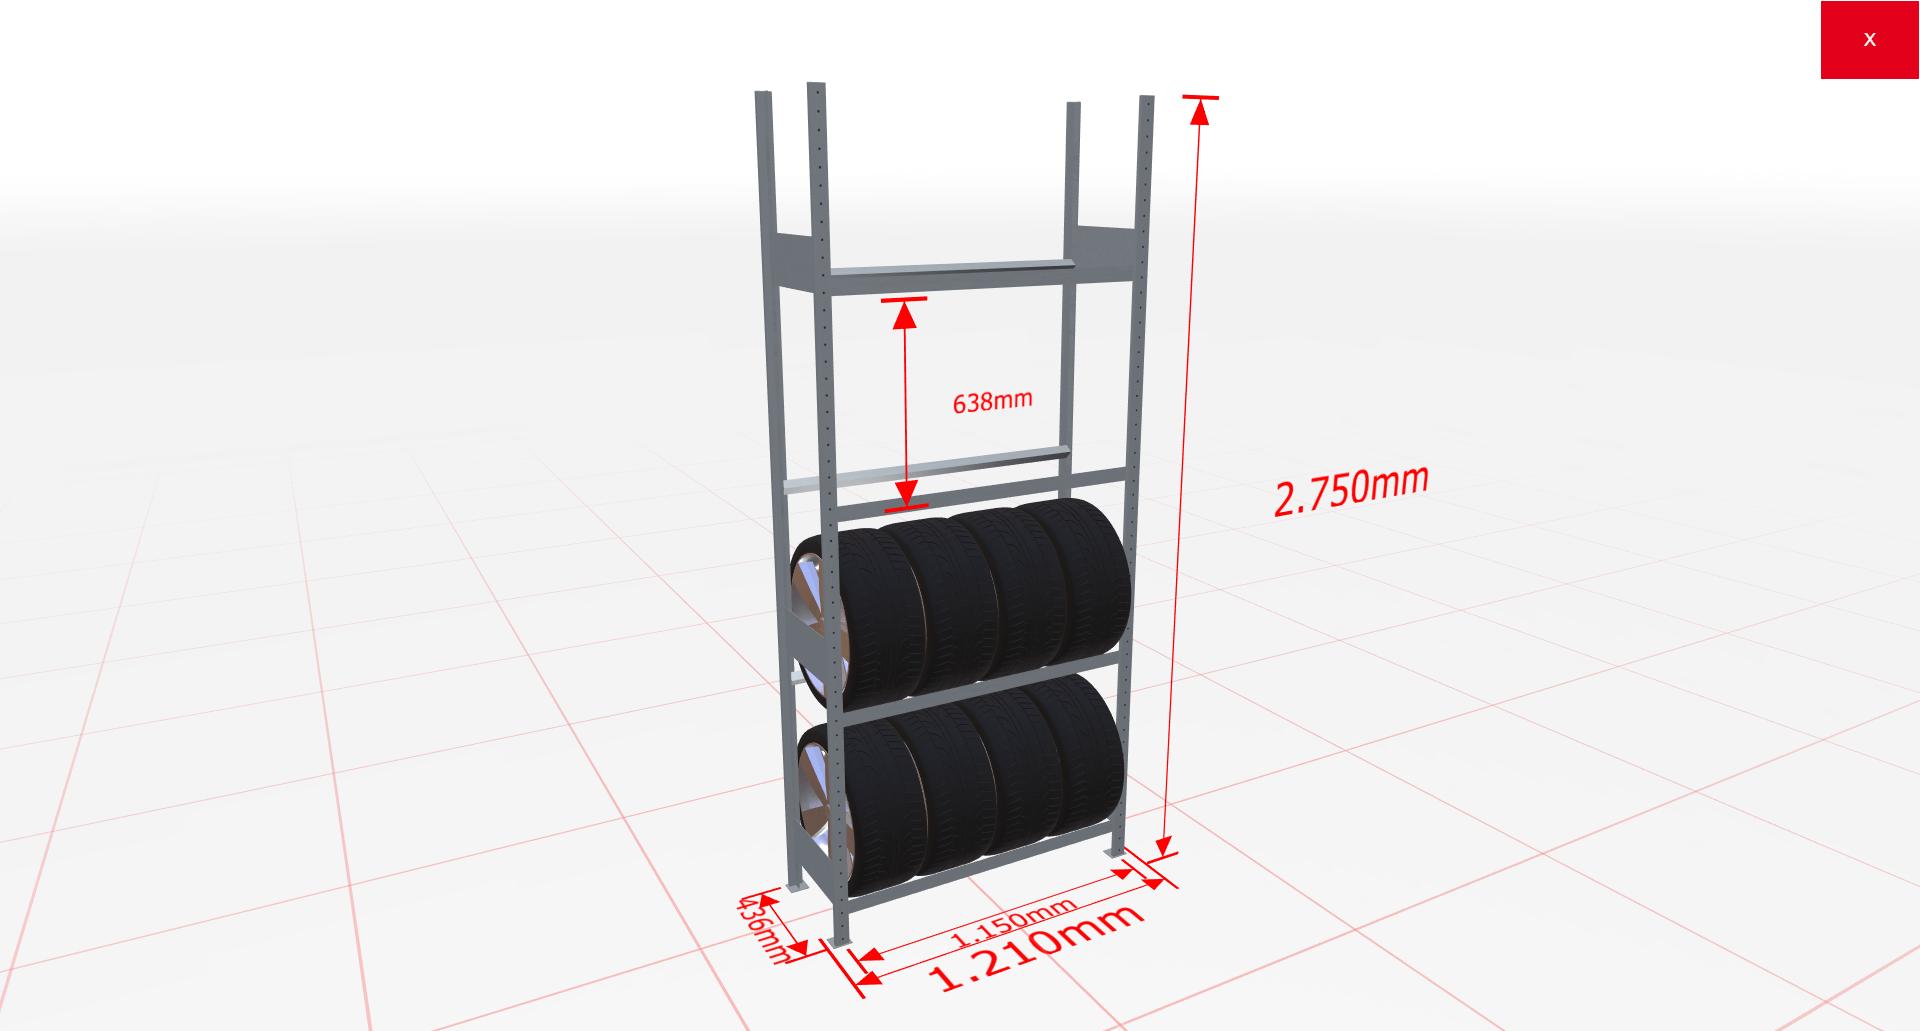 Räderregal Grundregal SCHULTE Lagertechnik 2750x1150x400 mm – 4 Ebenen á 1150 mm, verzinkt